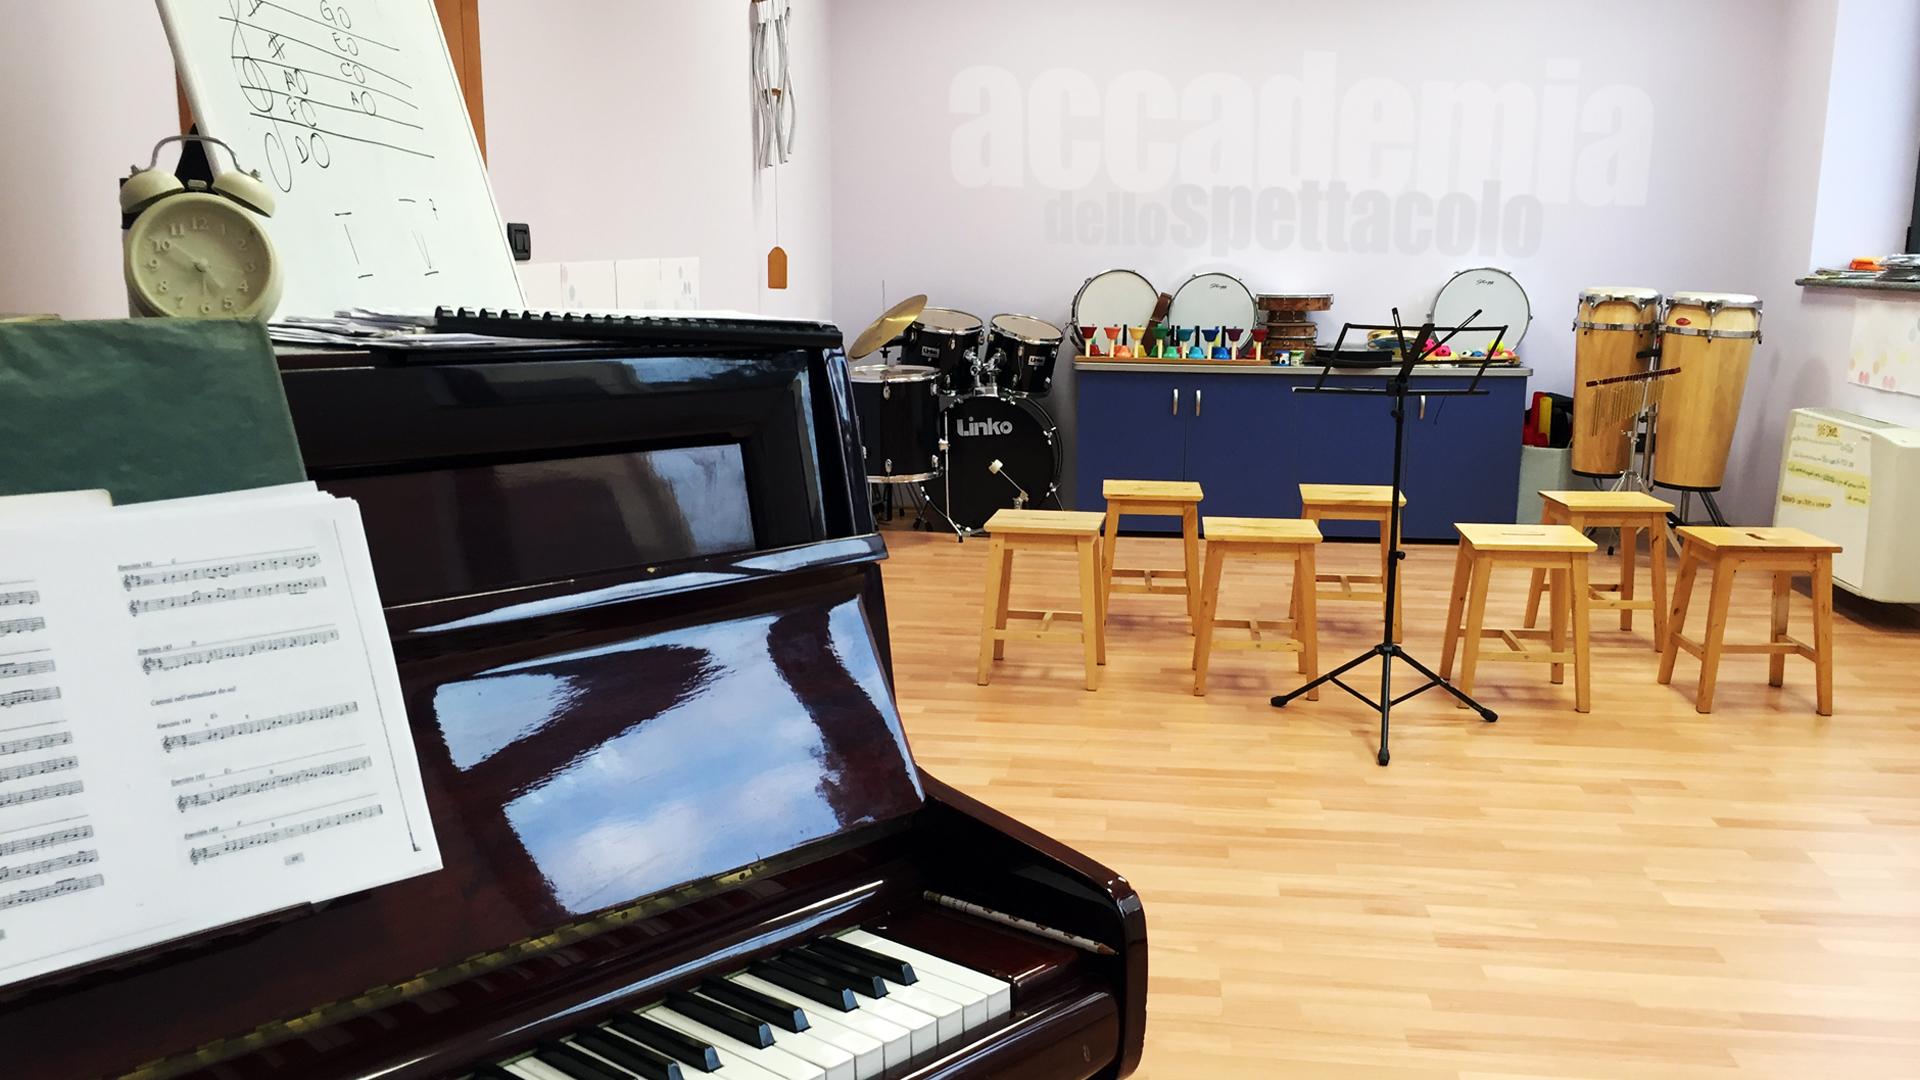 aula-musica